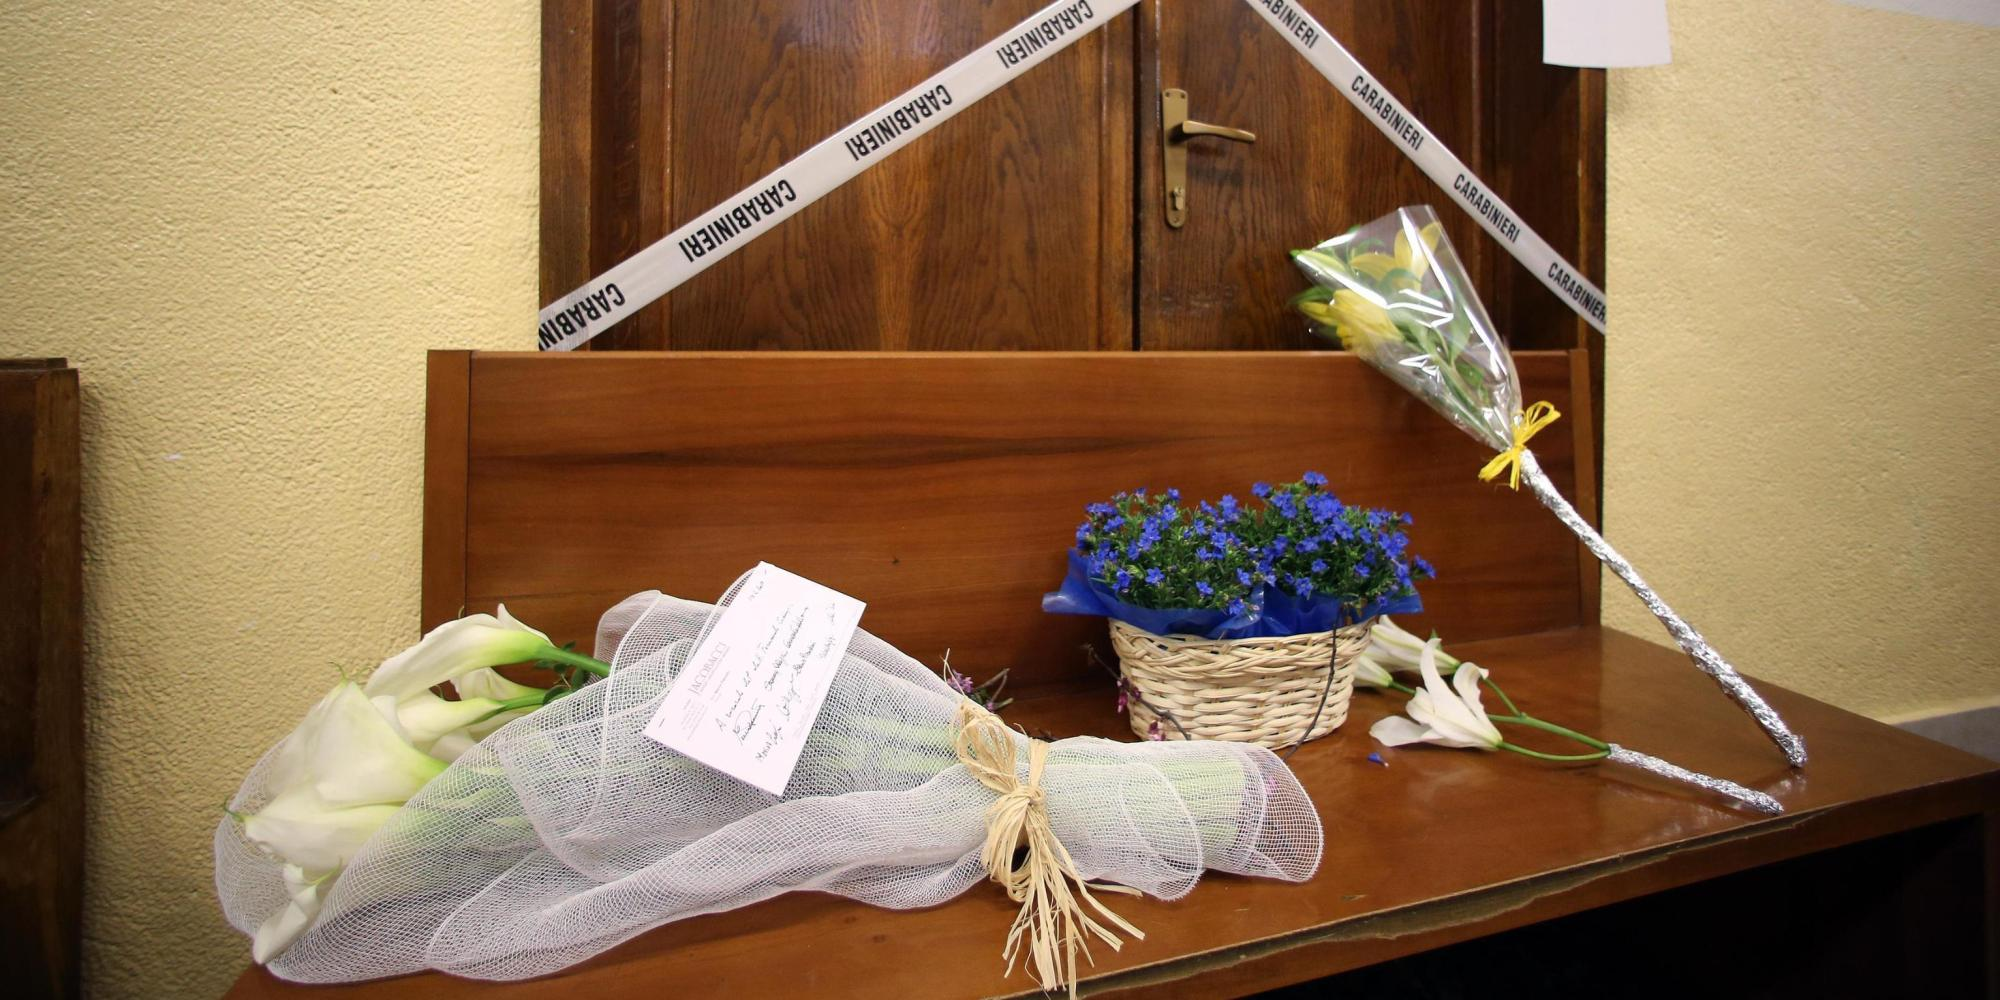 Spari Tribunale:fonti Chigi,funerali Stato per vittime